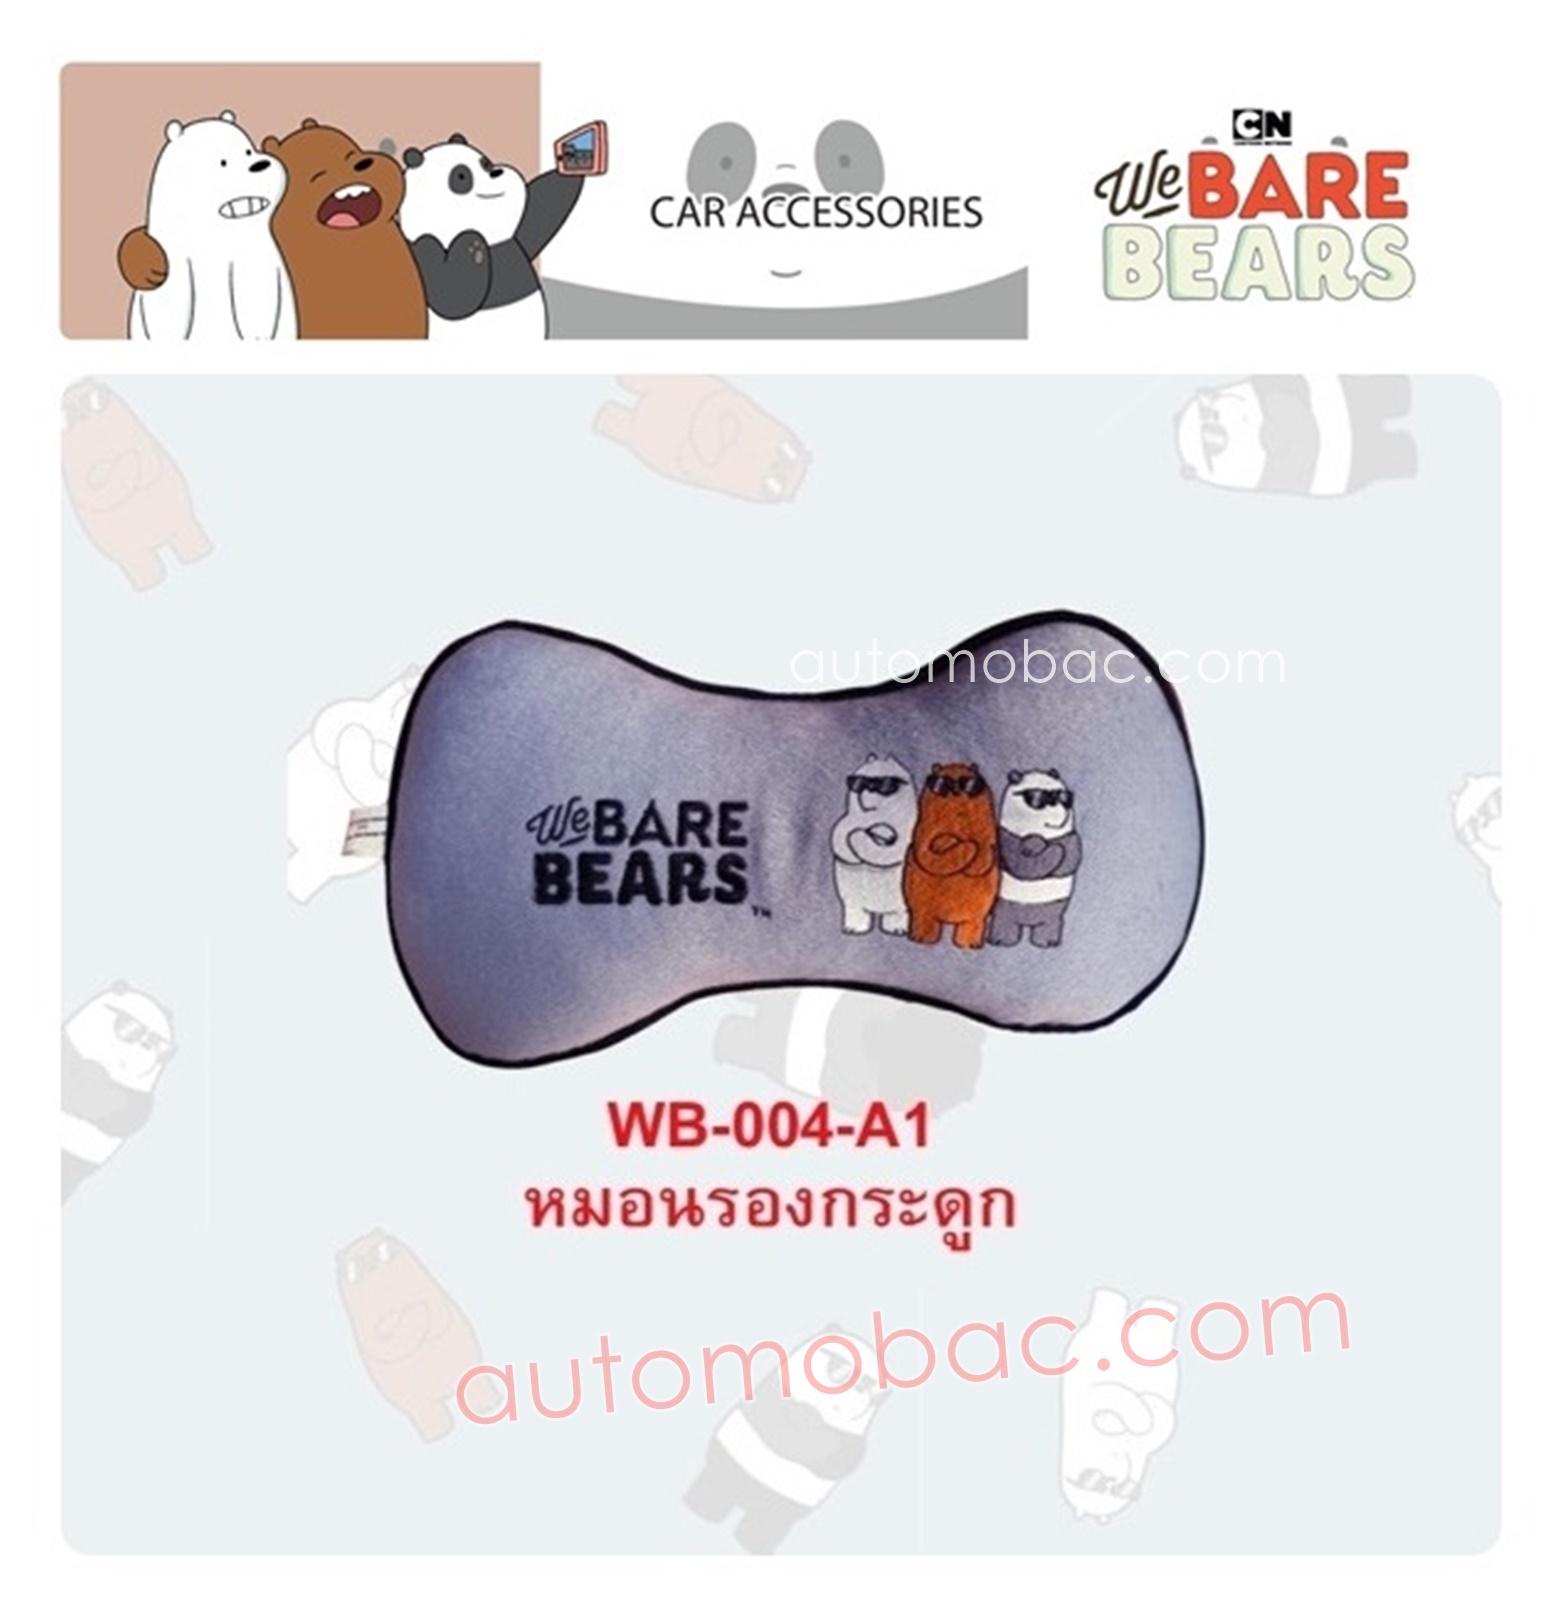 We Bare Bears หมอนรองคอกระดูก 1 ชิ้น ใช้รองคอเพื่อลดการปวดเมื่อยขณะขับรถ เป็นใยสังเคราะห์เกรด A